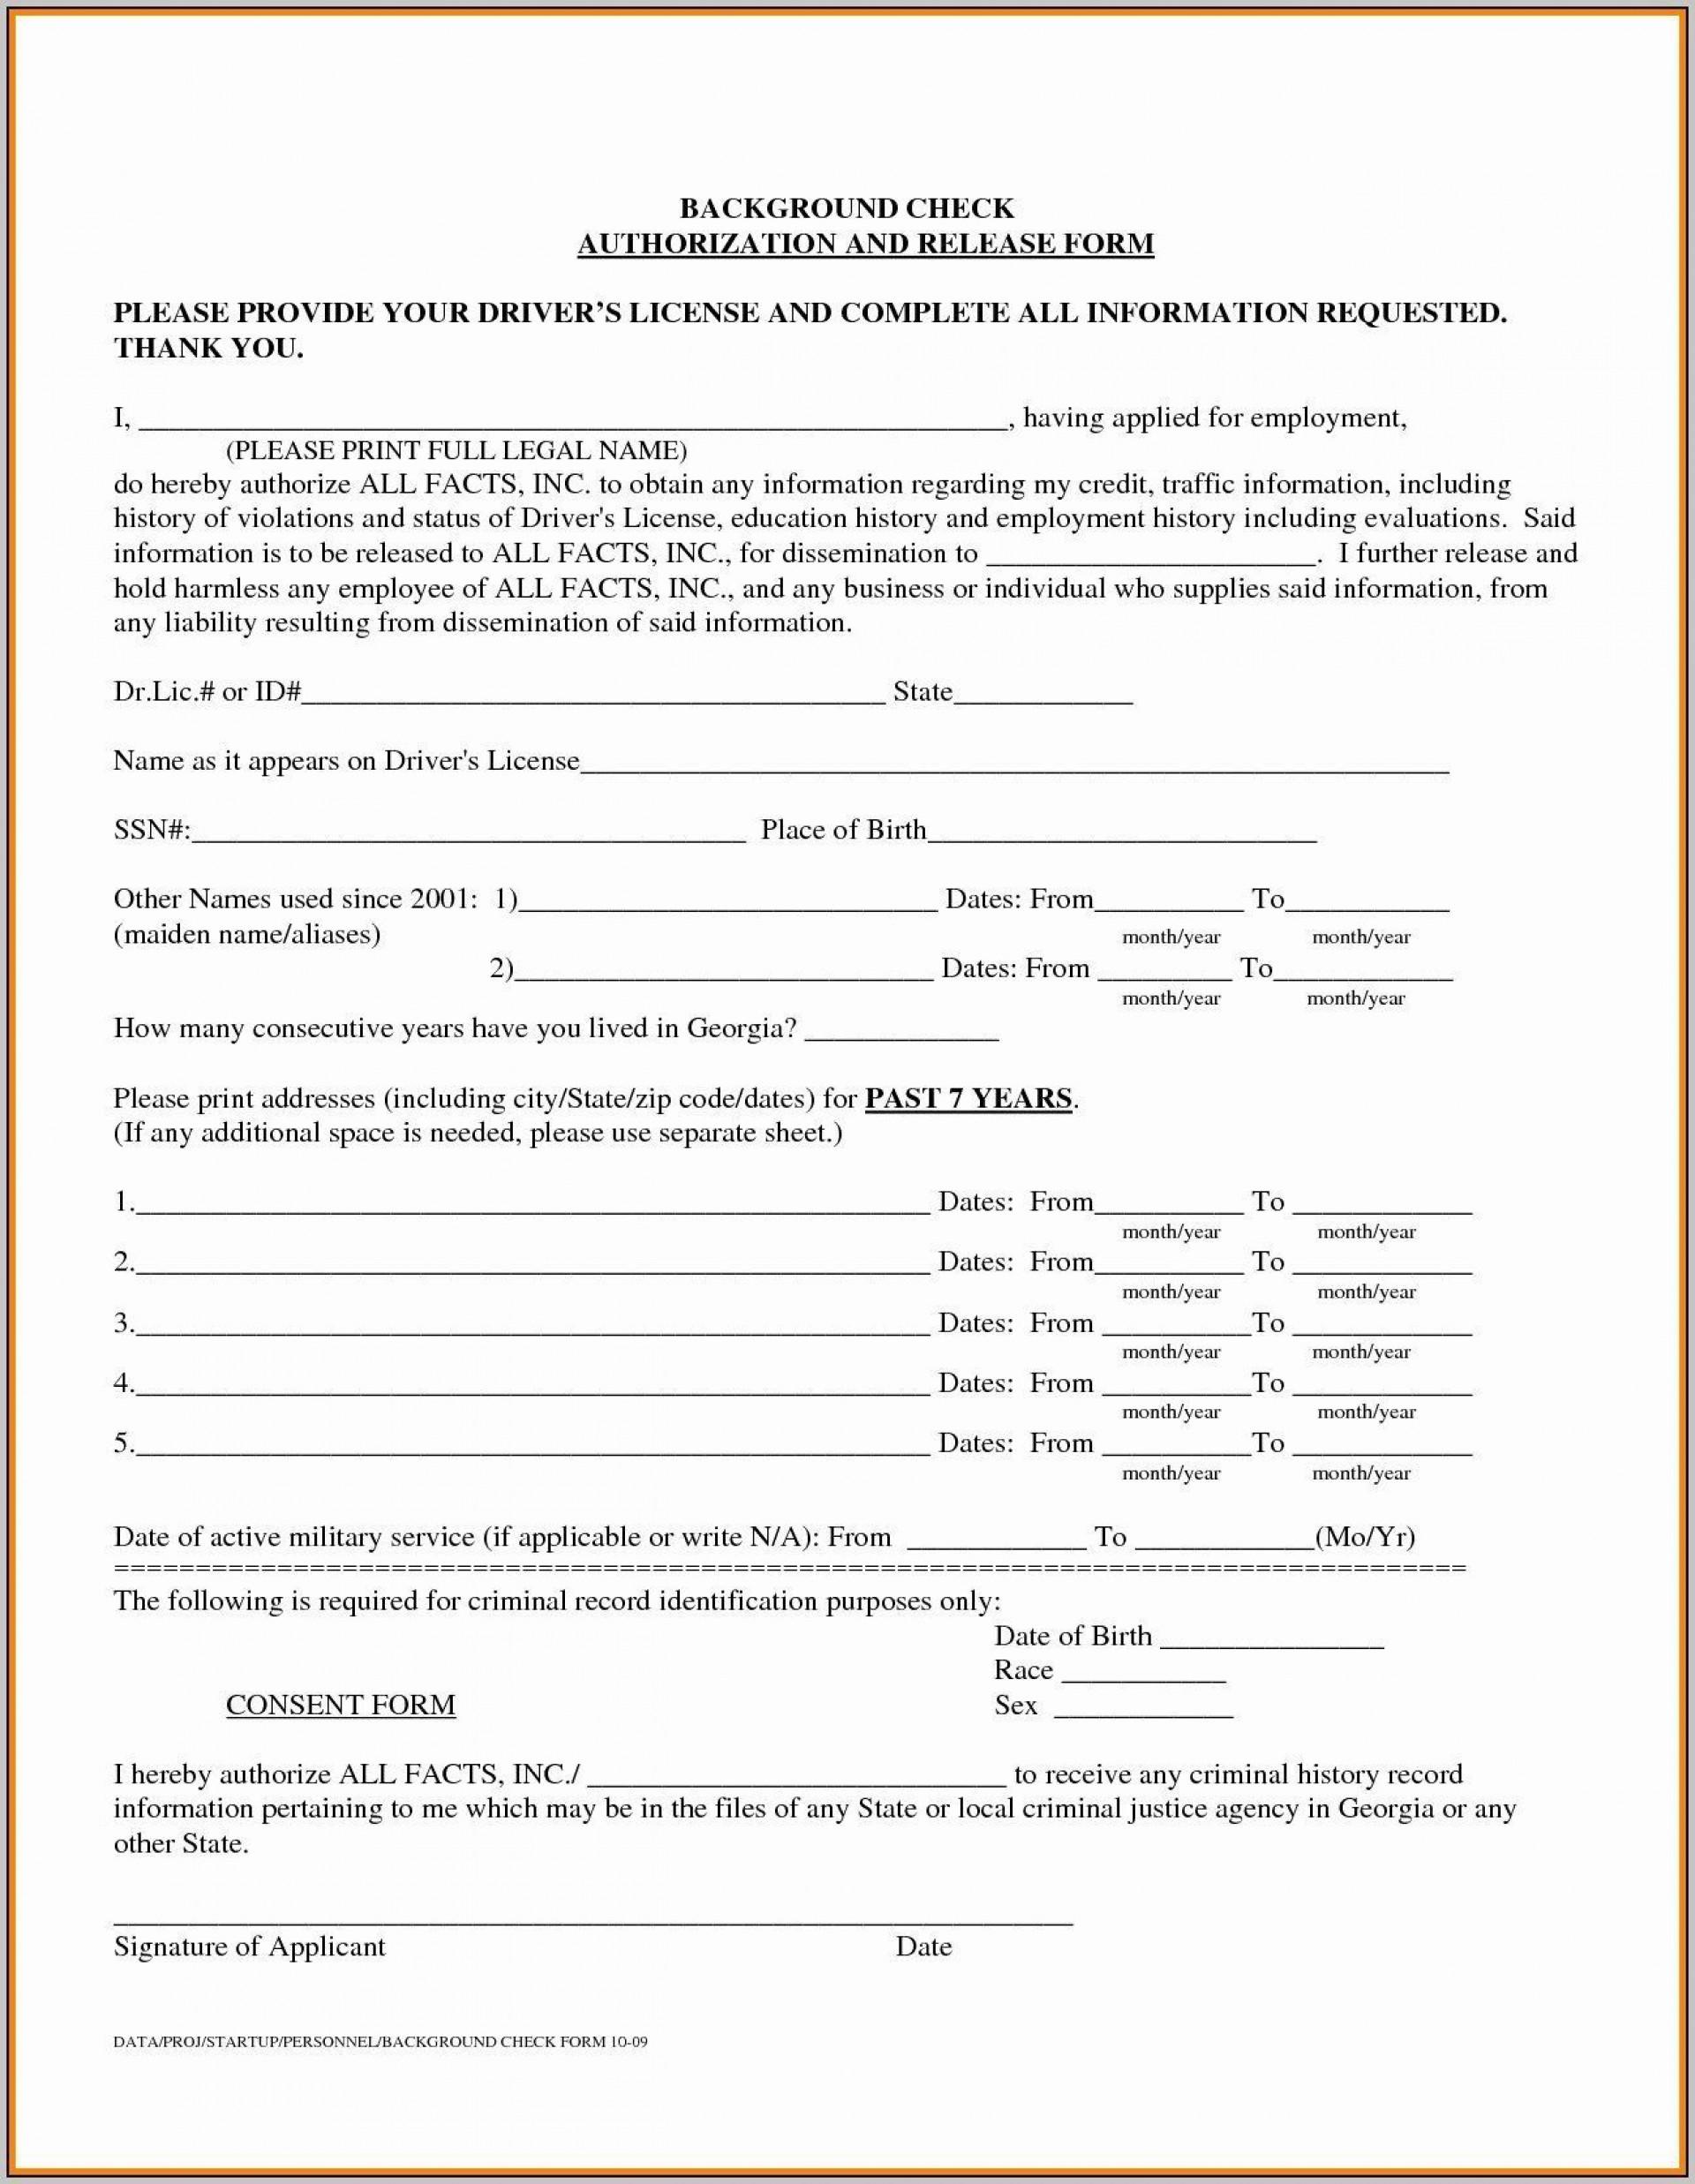 000 Singular Background Check Form Template Free Idea  Authorization1920